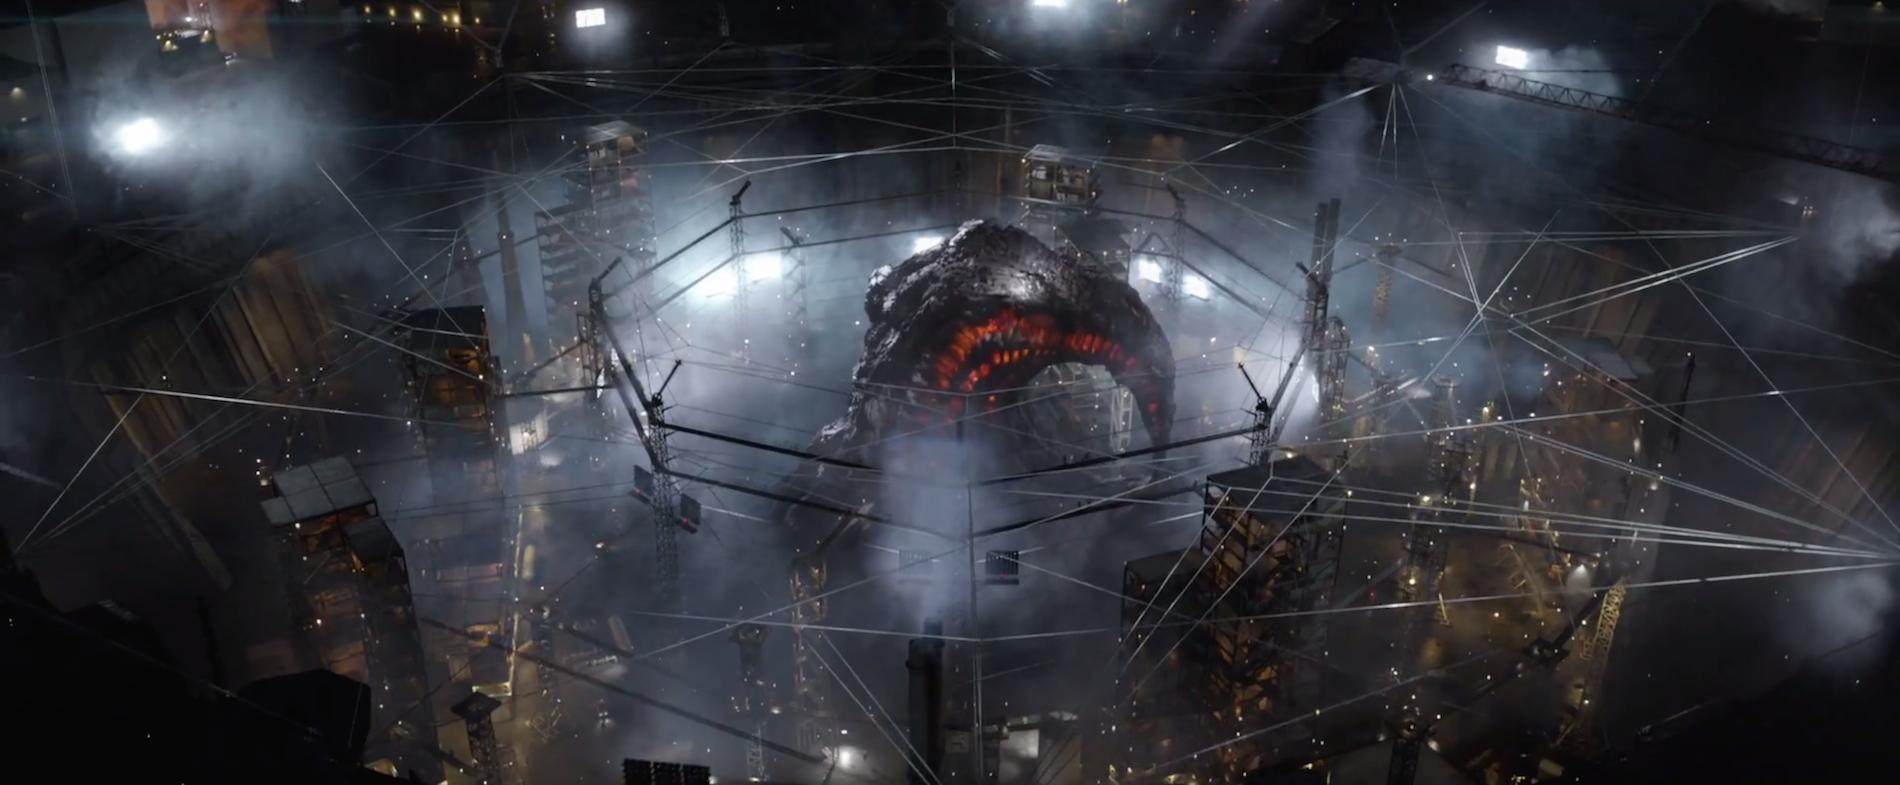 screen-shot-2014-04-29-at-04-47-18-new-godzilla-trailer-reveals-all-muto-monster-confirmed